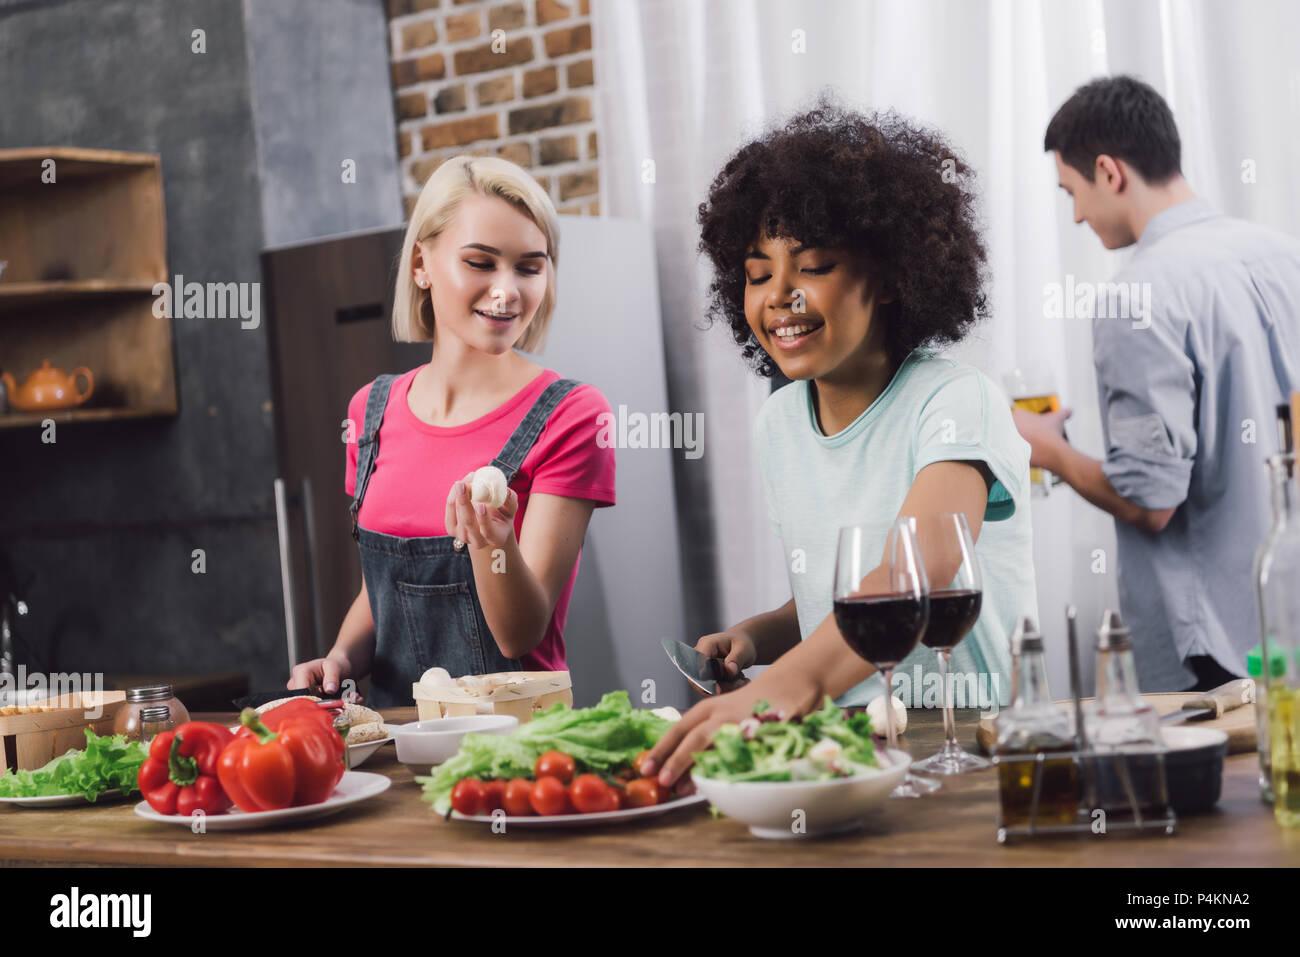 Sorridenti ragazze multietnica di cottura in cucina Immagini Stock